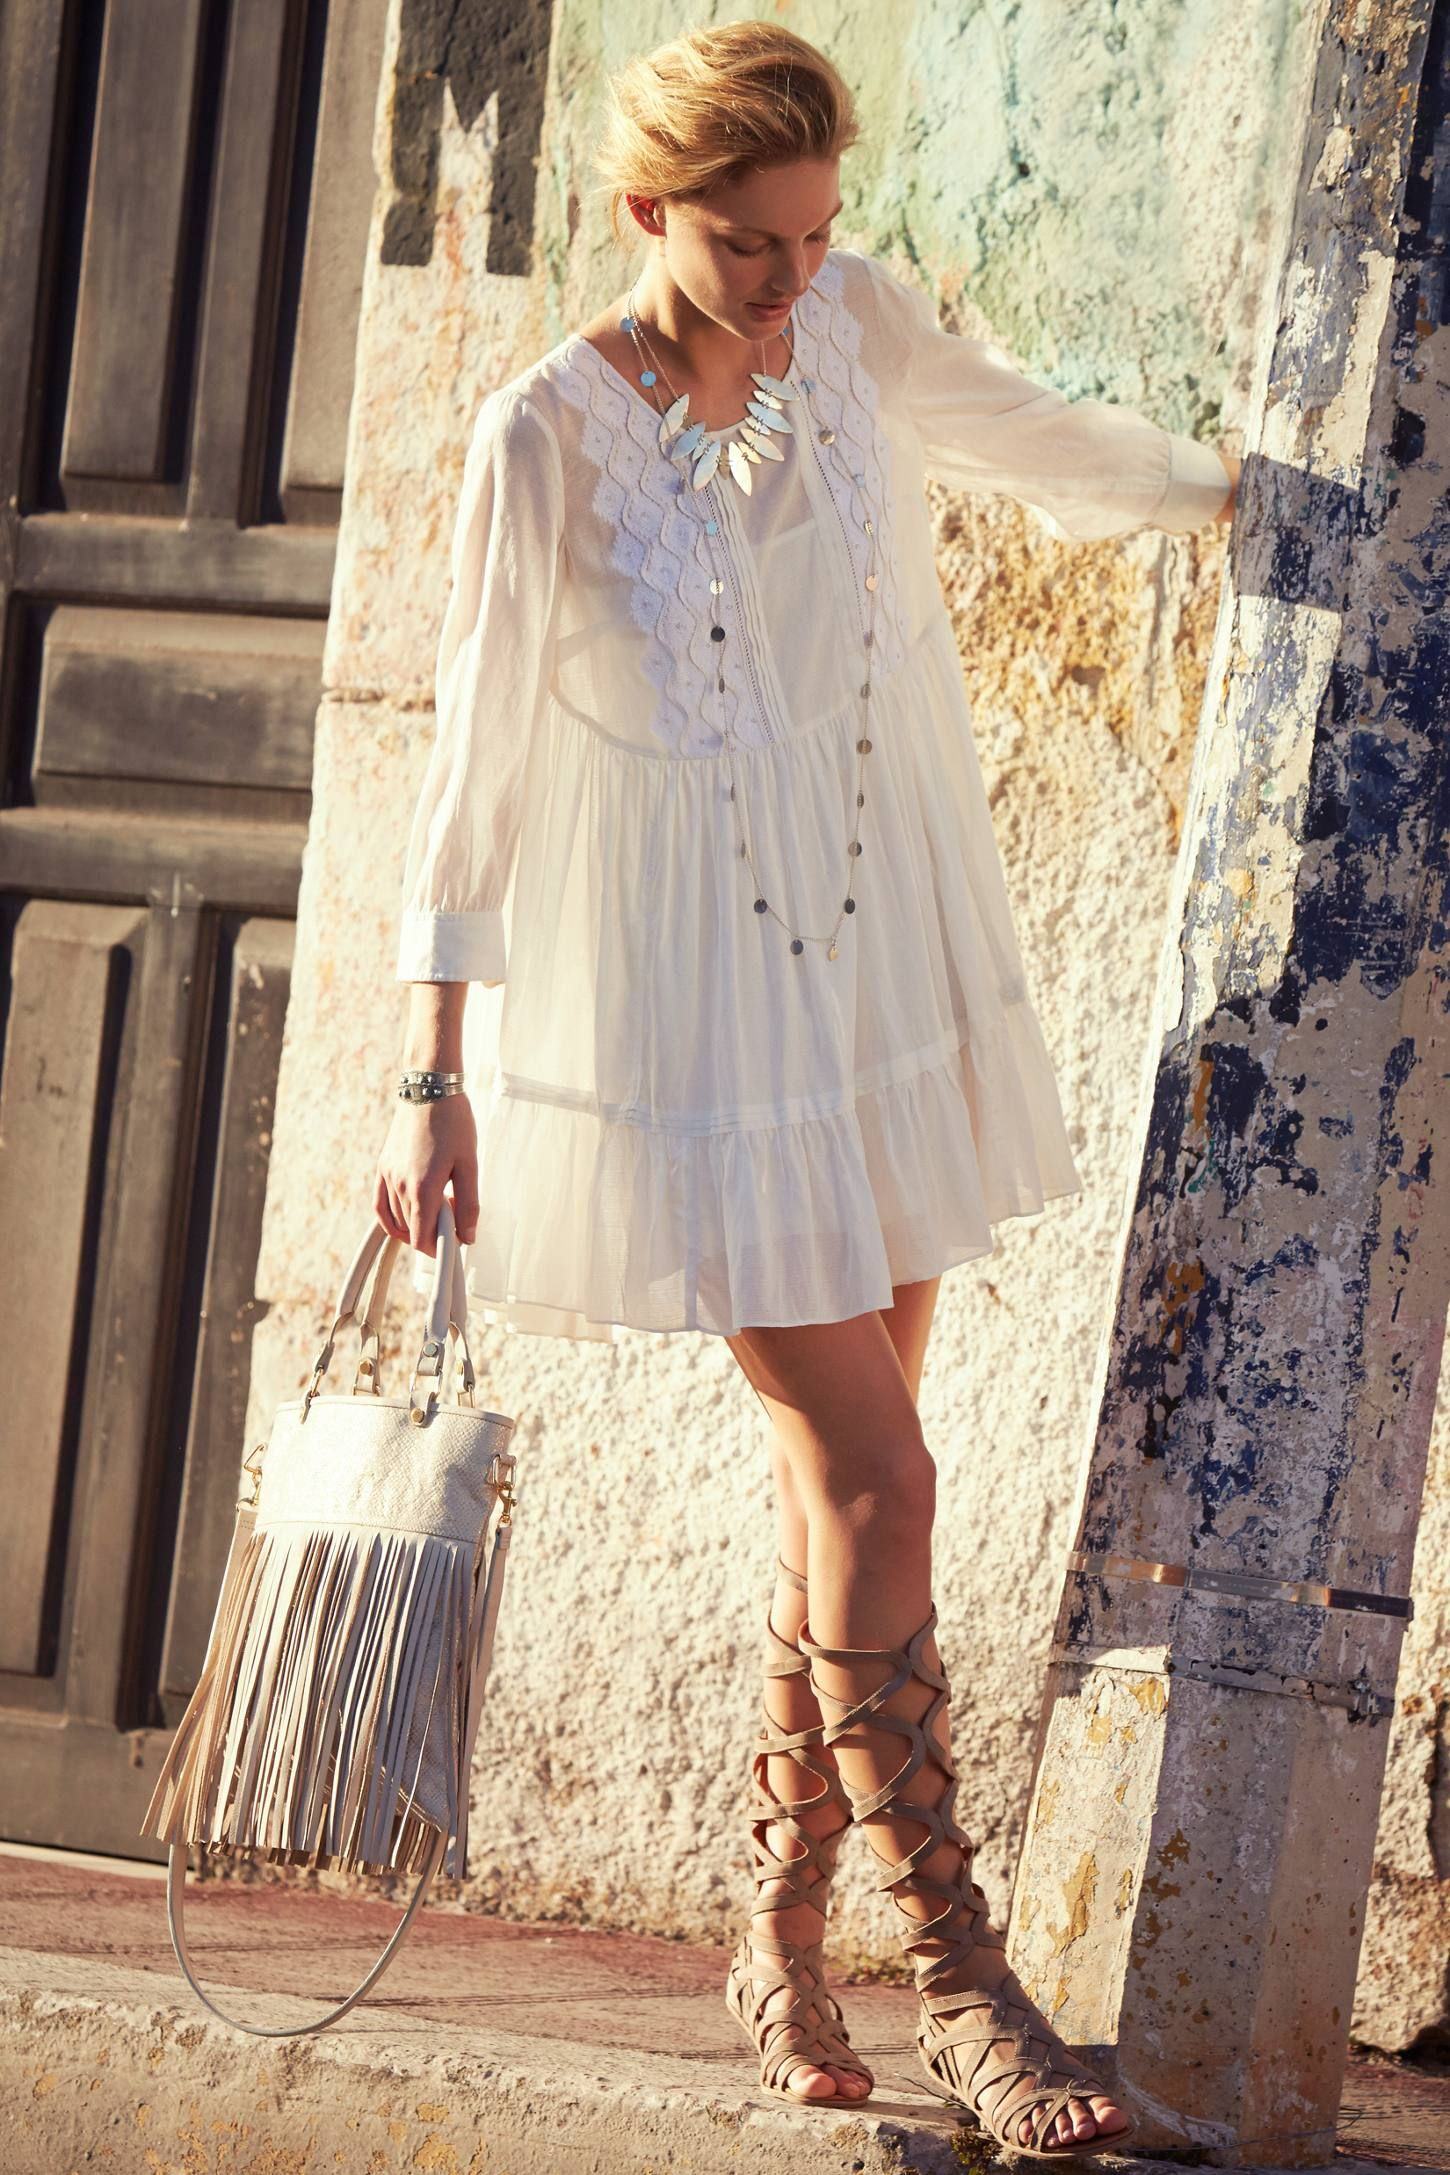 bc649e2cb33d totally my style, i love this Bermeja Tunic Dress - anthropologie.com White  Dress